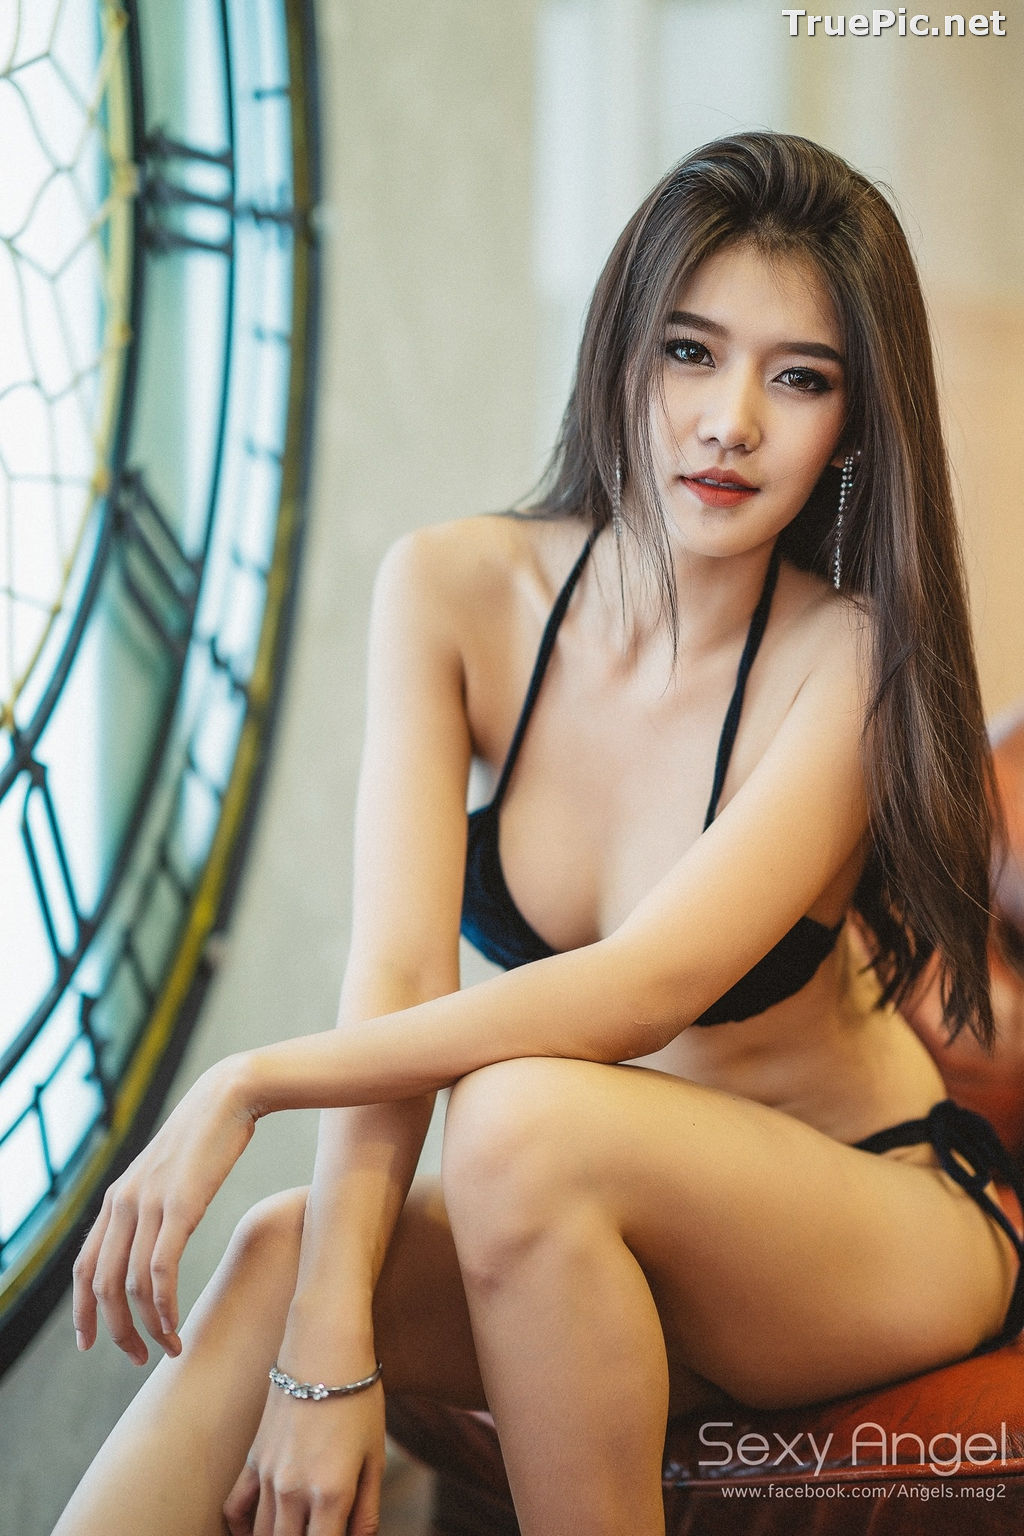 Image Thailand Model - Saruda Chalermsaen (EveAva) - Sexy Bikini Angel - TruePic.net - Picture-3